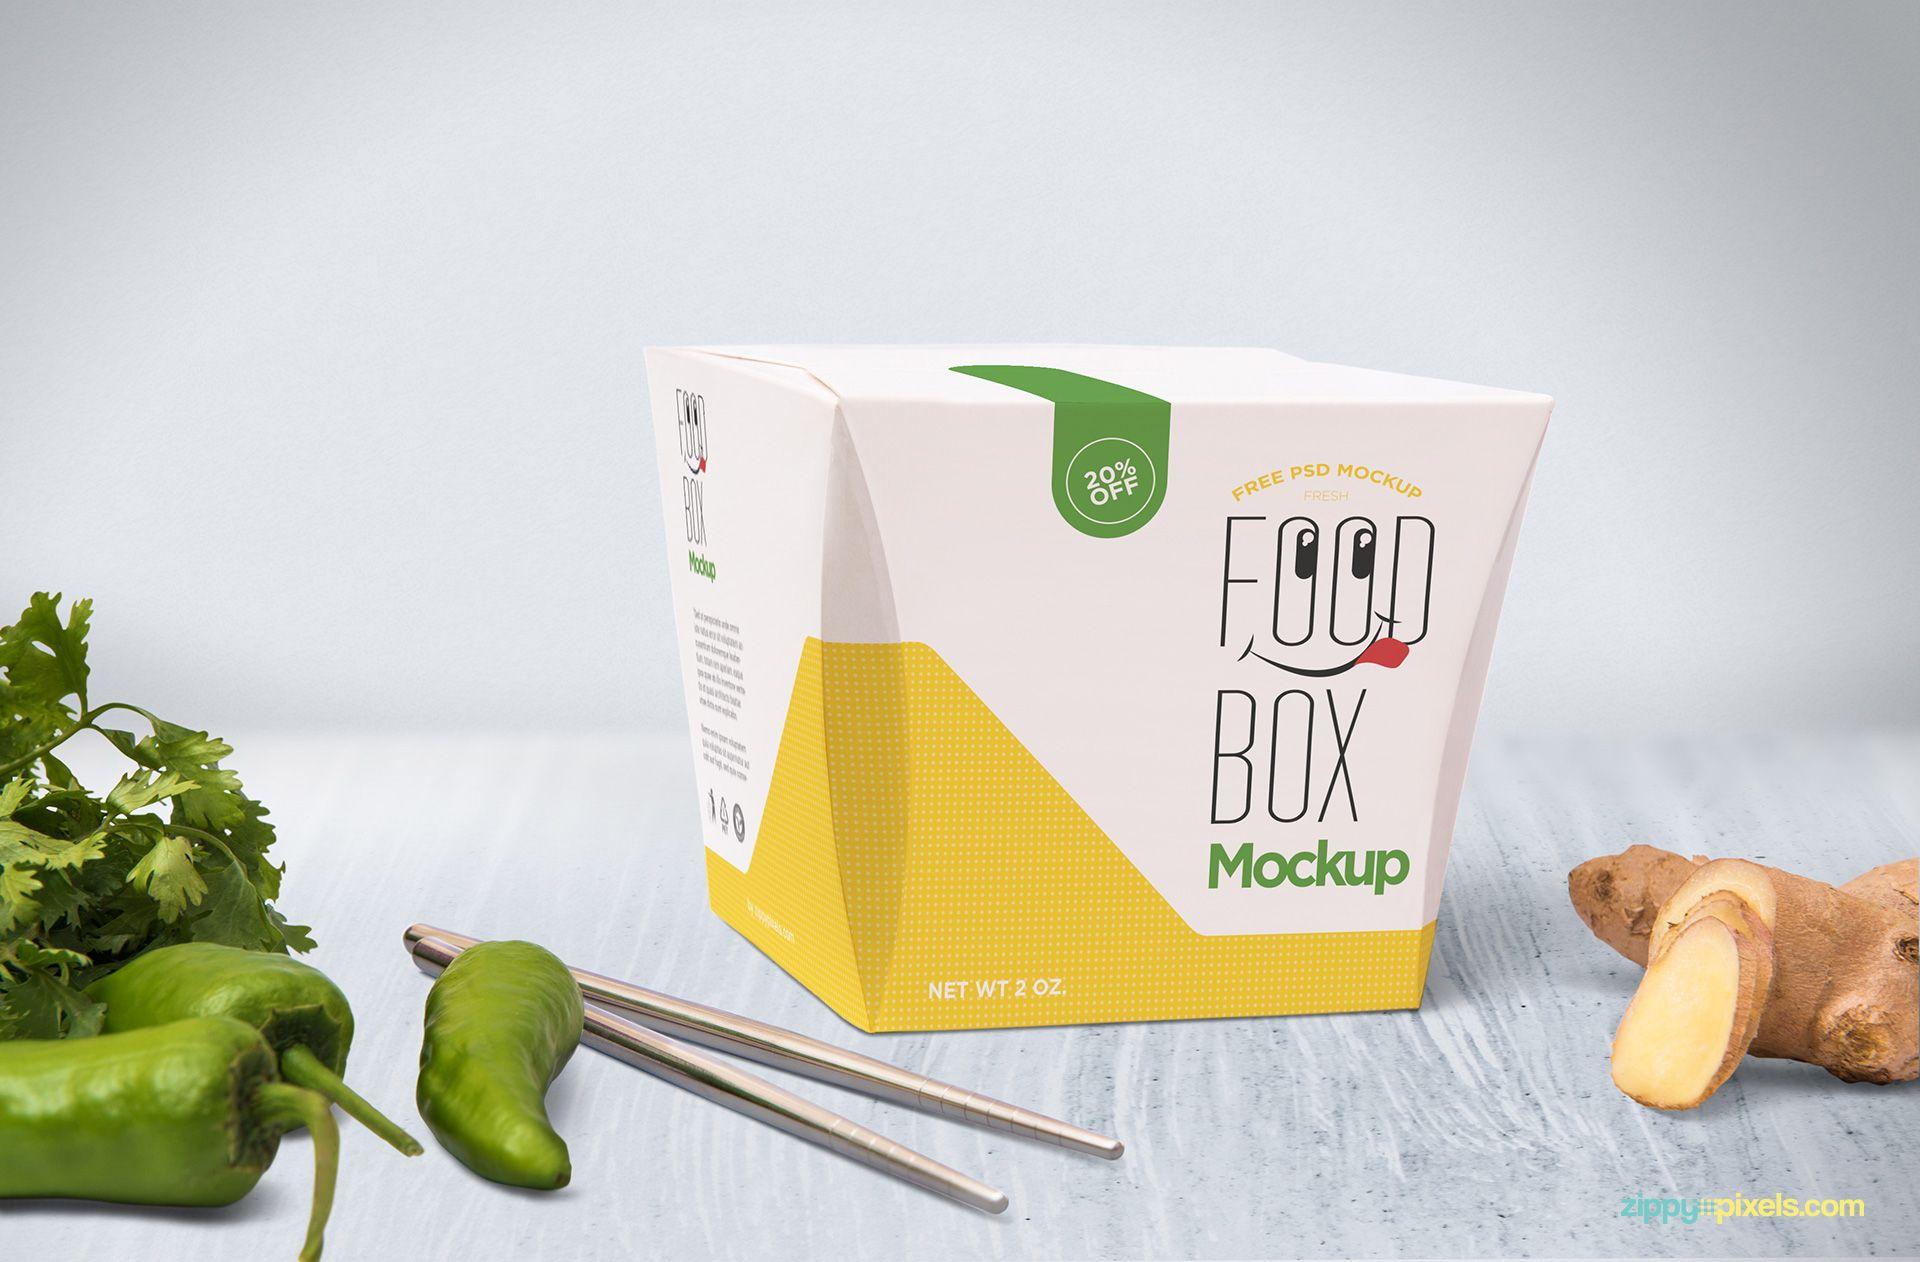 Free Realistic Lunch Box Mockup